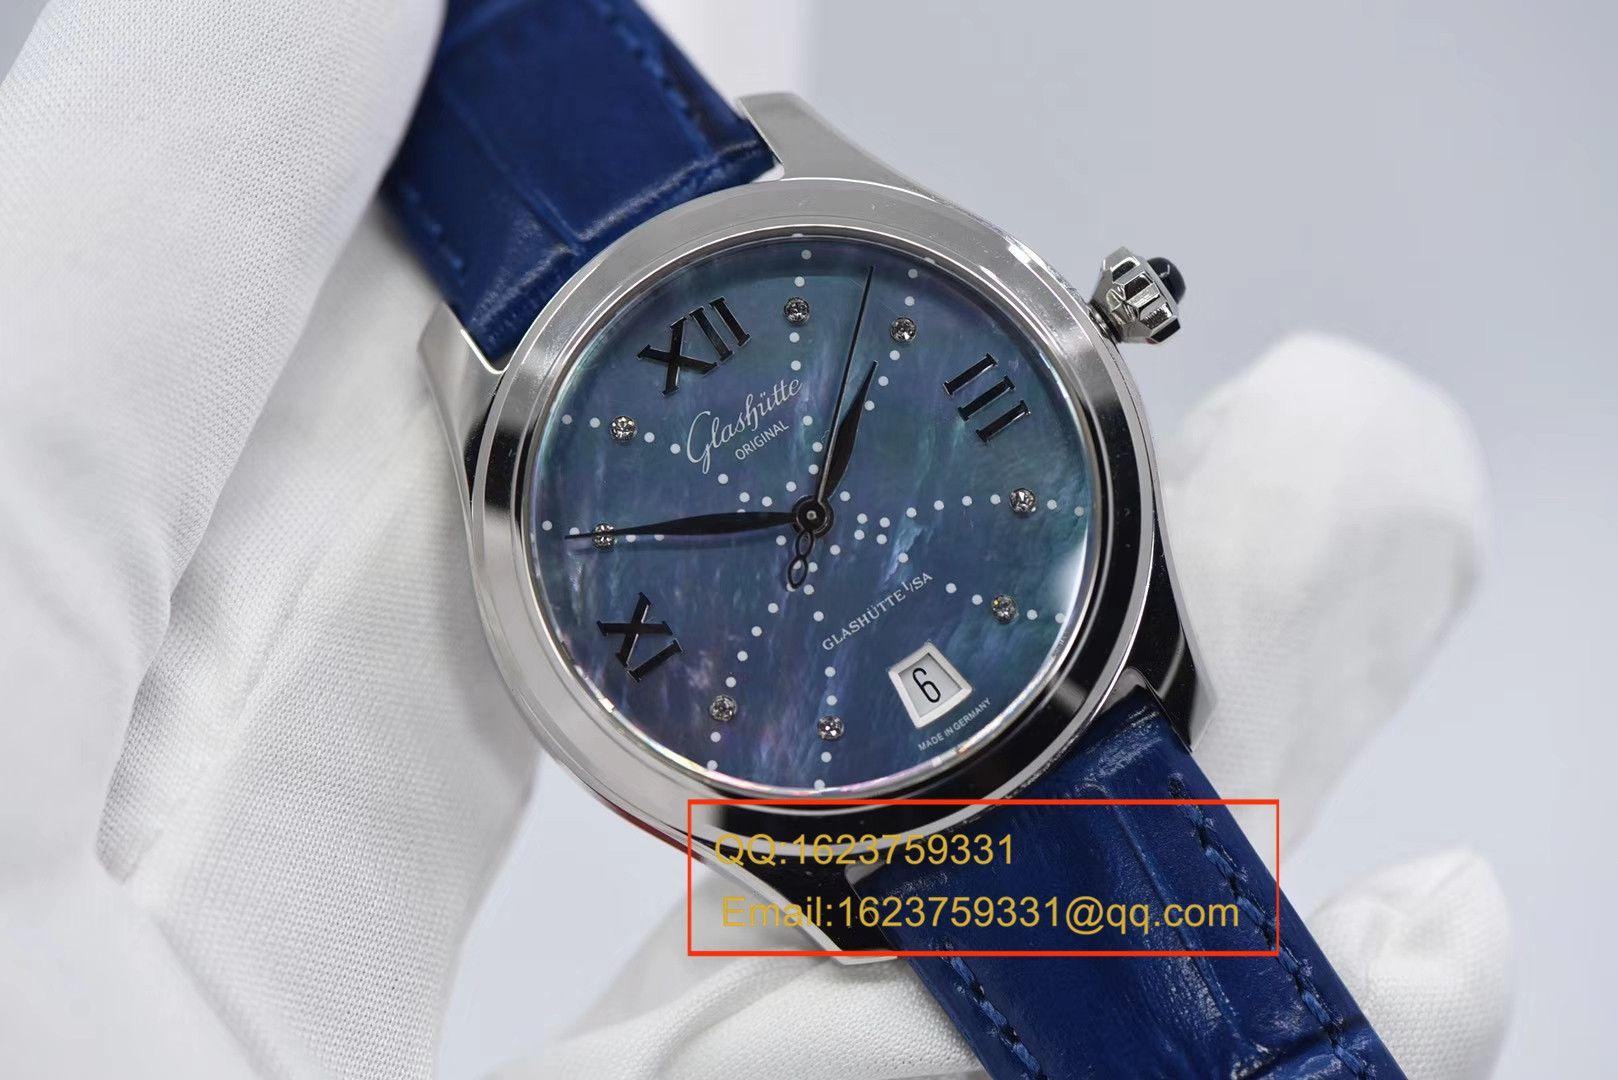 【FK一比一超A复刻手表】格拉苏蒂原创女表系列 1-39-22-11-02-04腕表 / GLA050